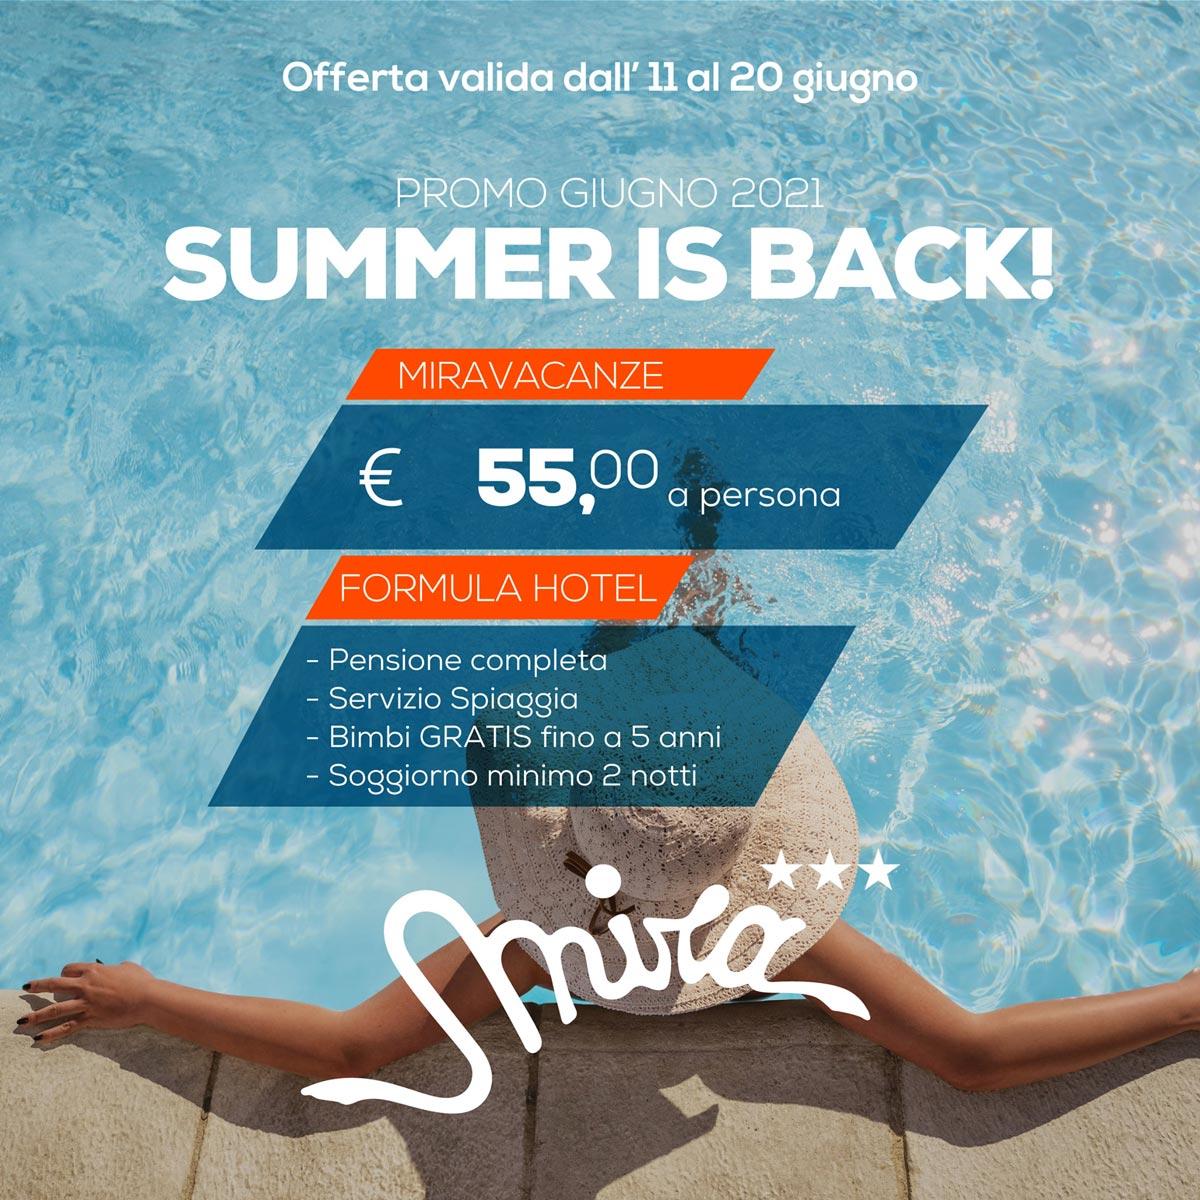 summer-is-back-2021